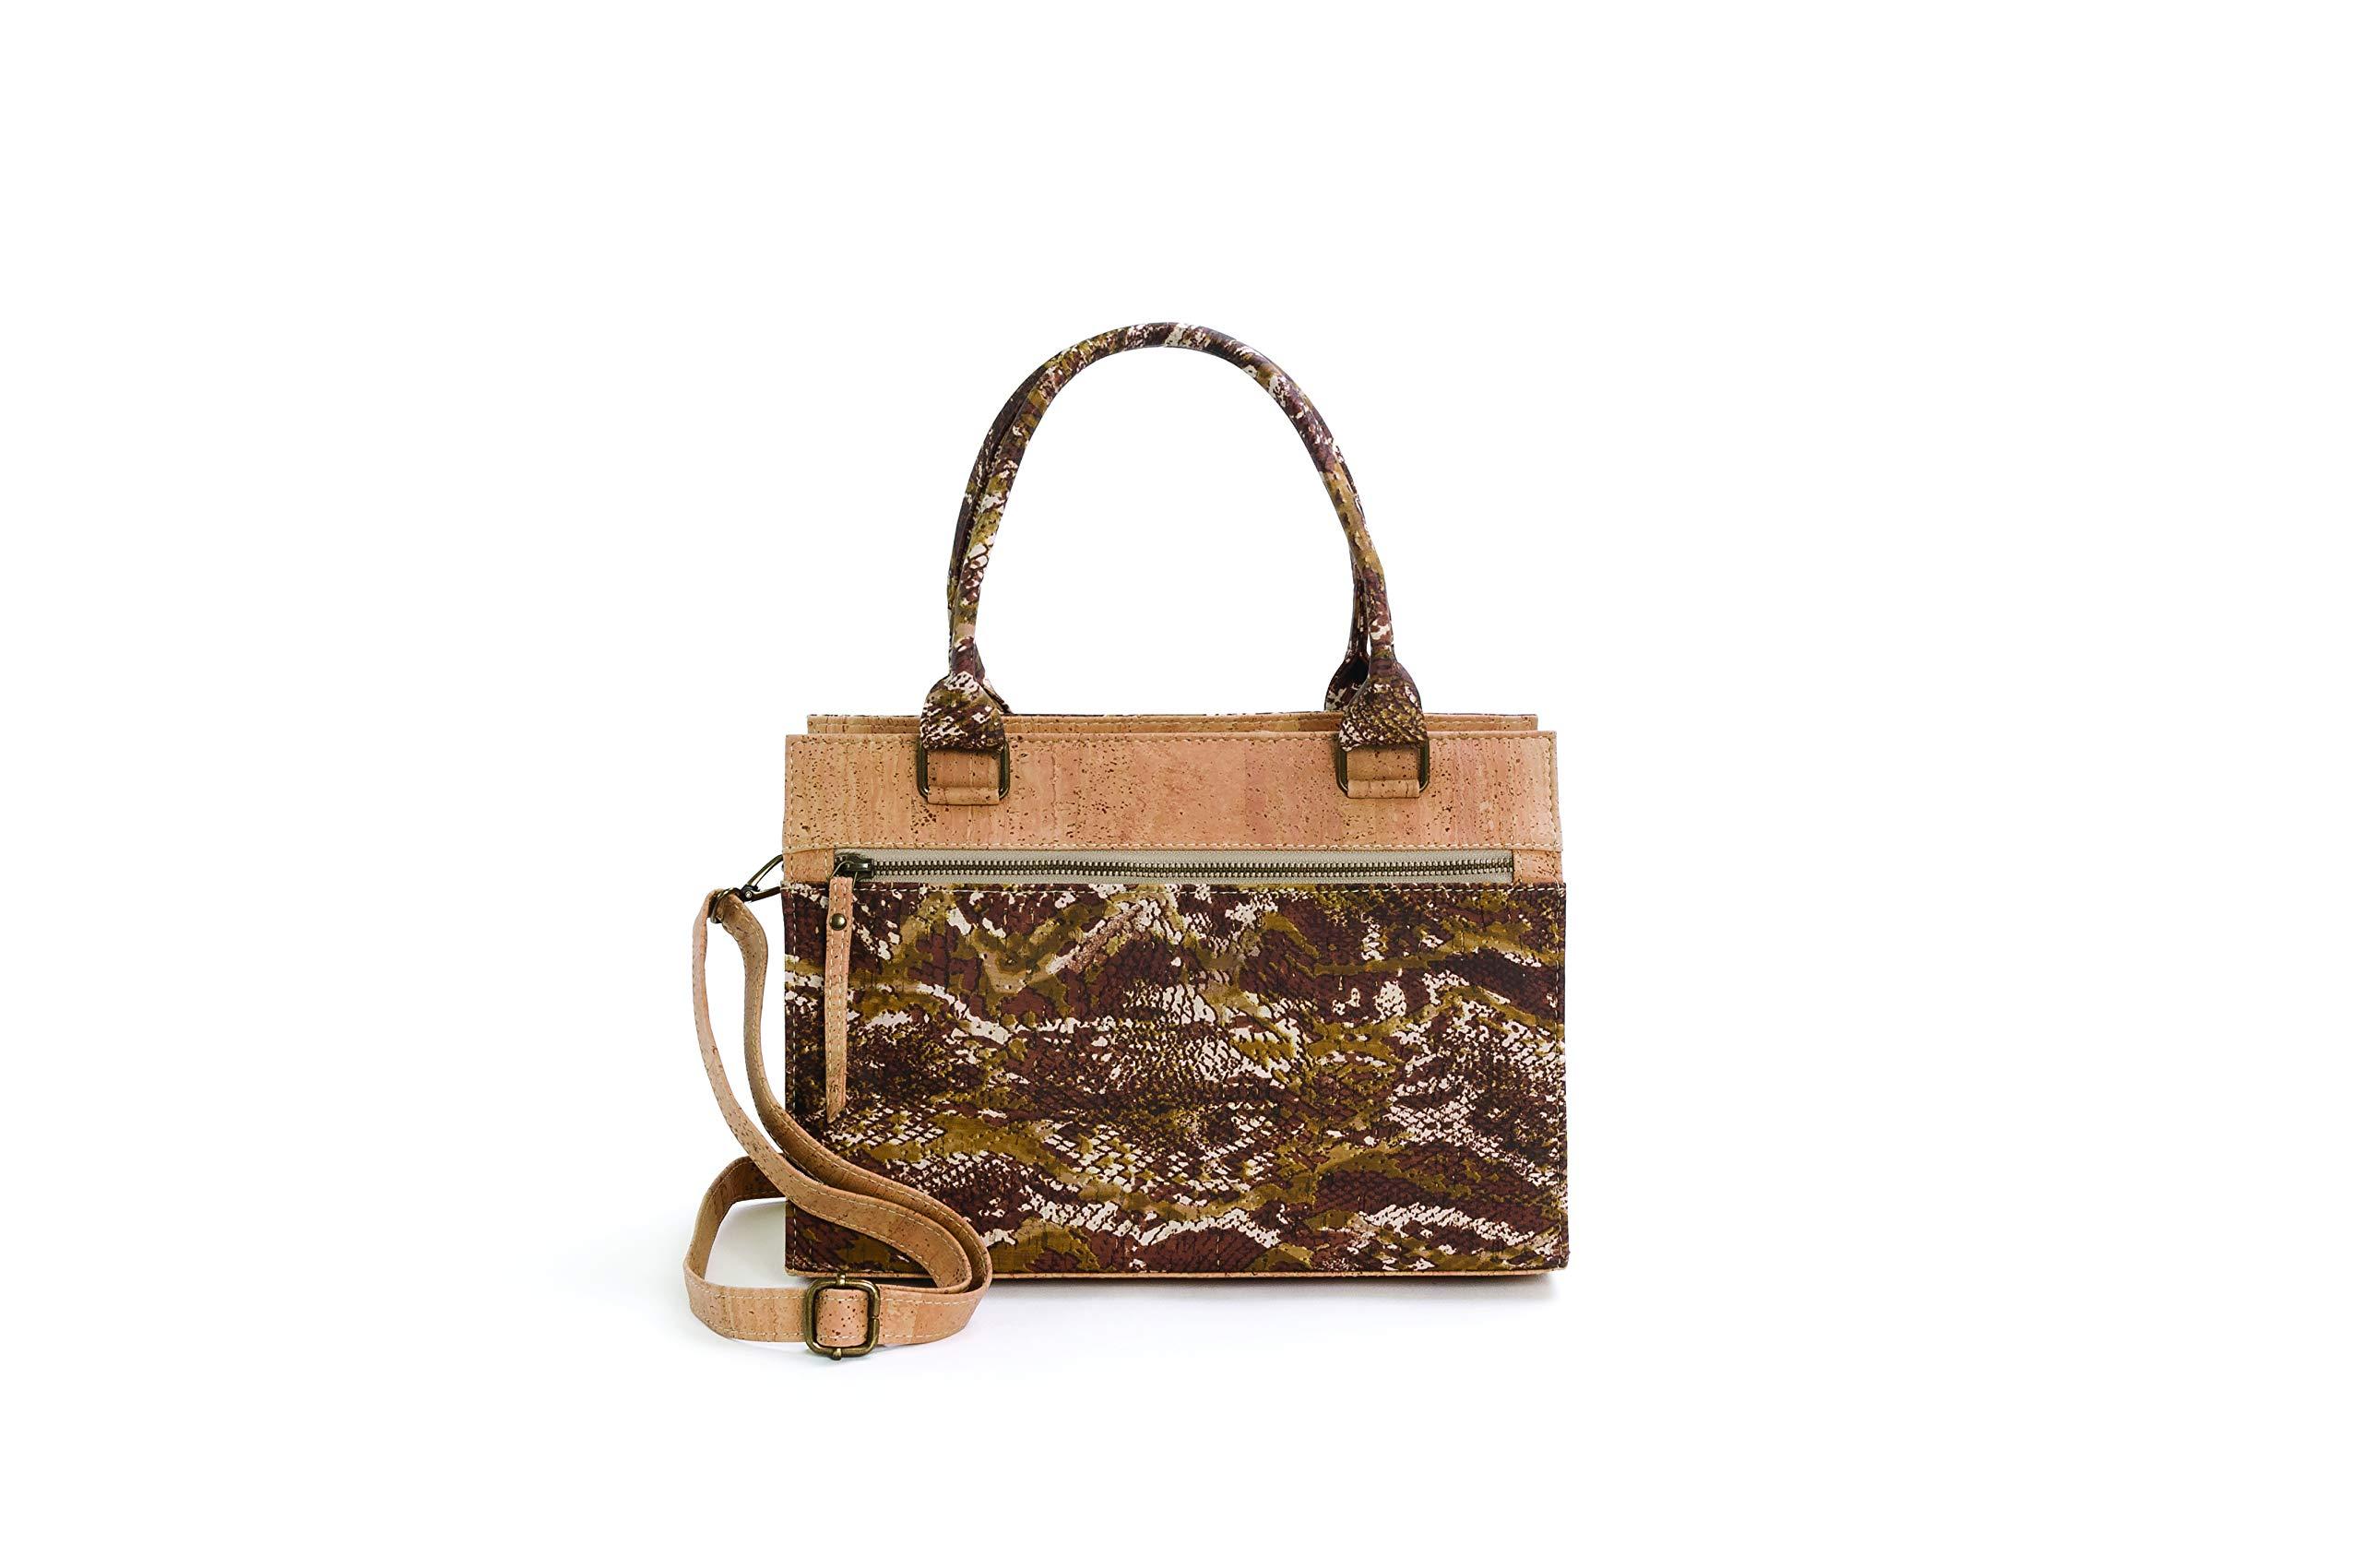 d69afafdd4ea Artelusa Cork Handbag for Women, Handmade in Portugal with Natural Premium  Cork (a Vegan Alternative to Leather - VeganoStore